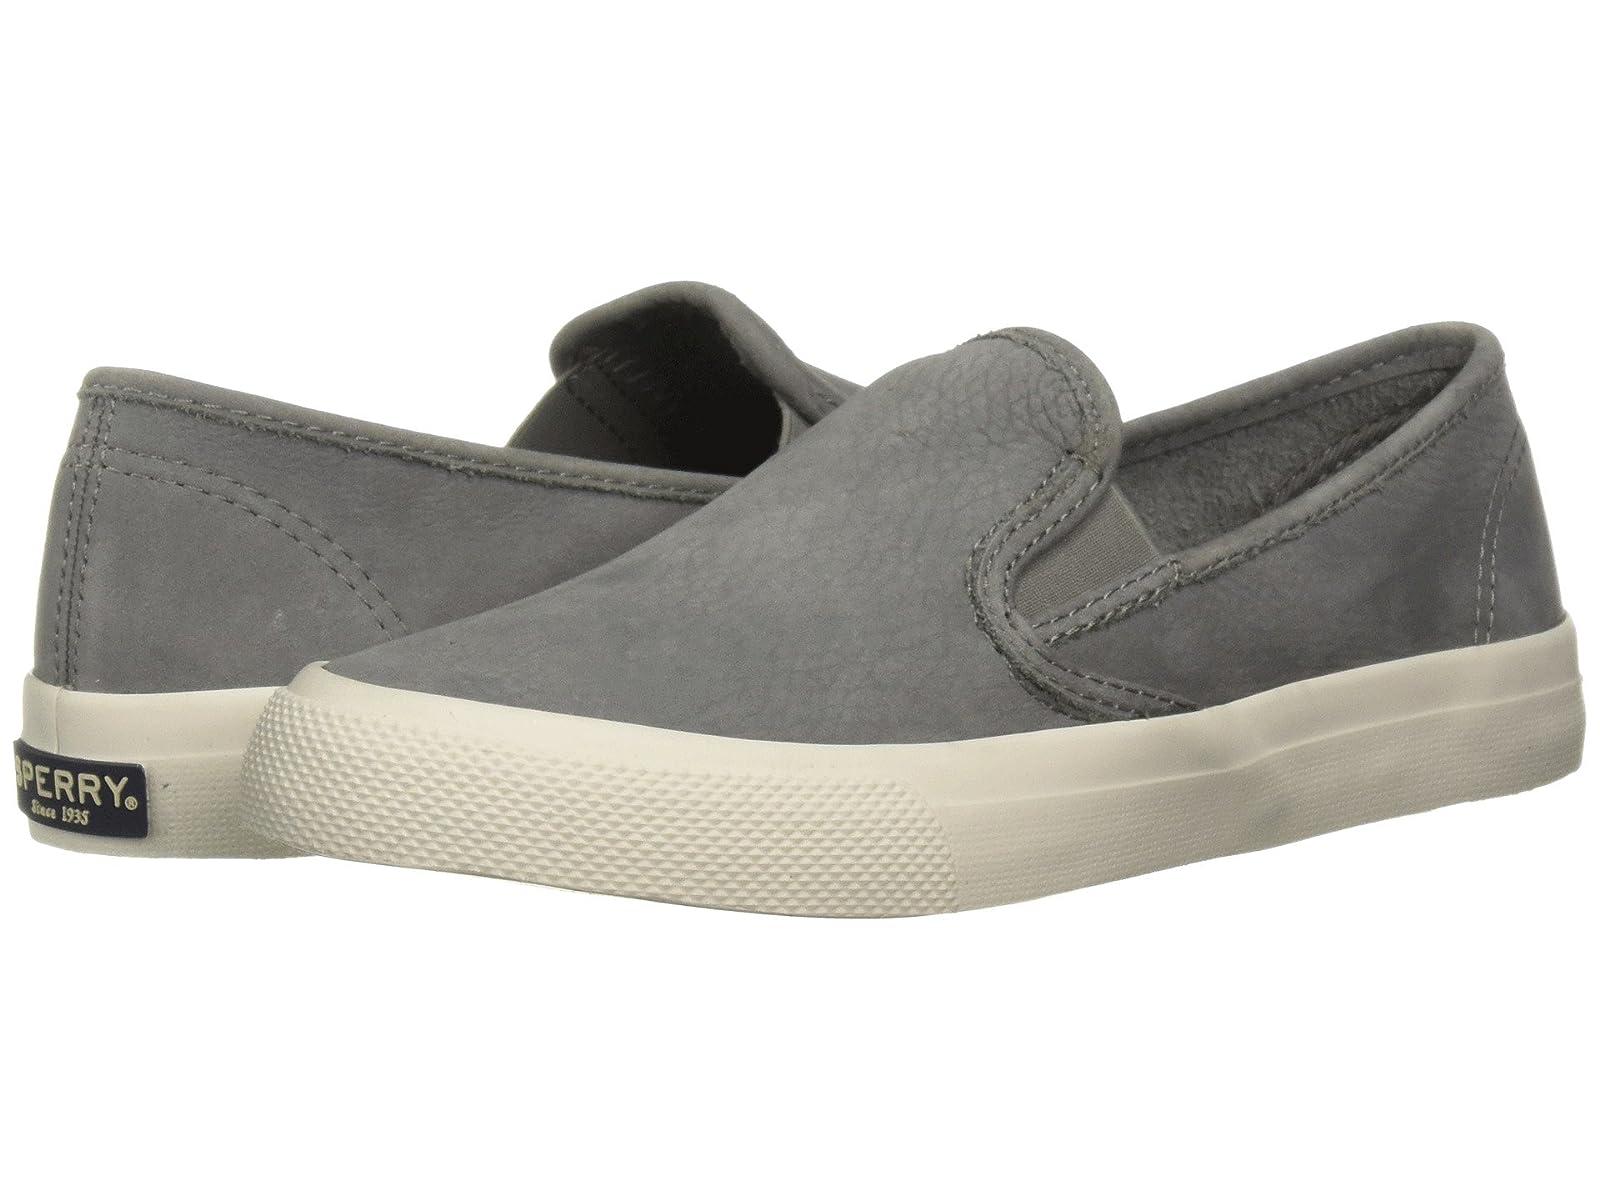 Sperry Seaside WashableAtmospheric grades have affordable shoes